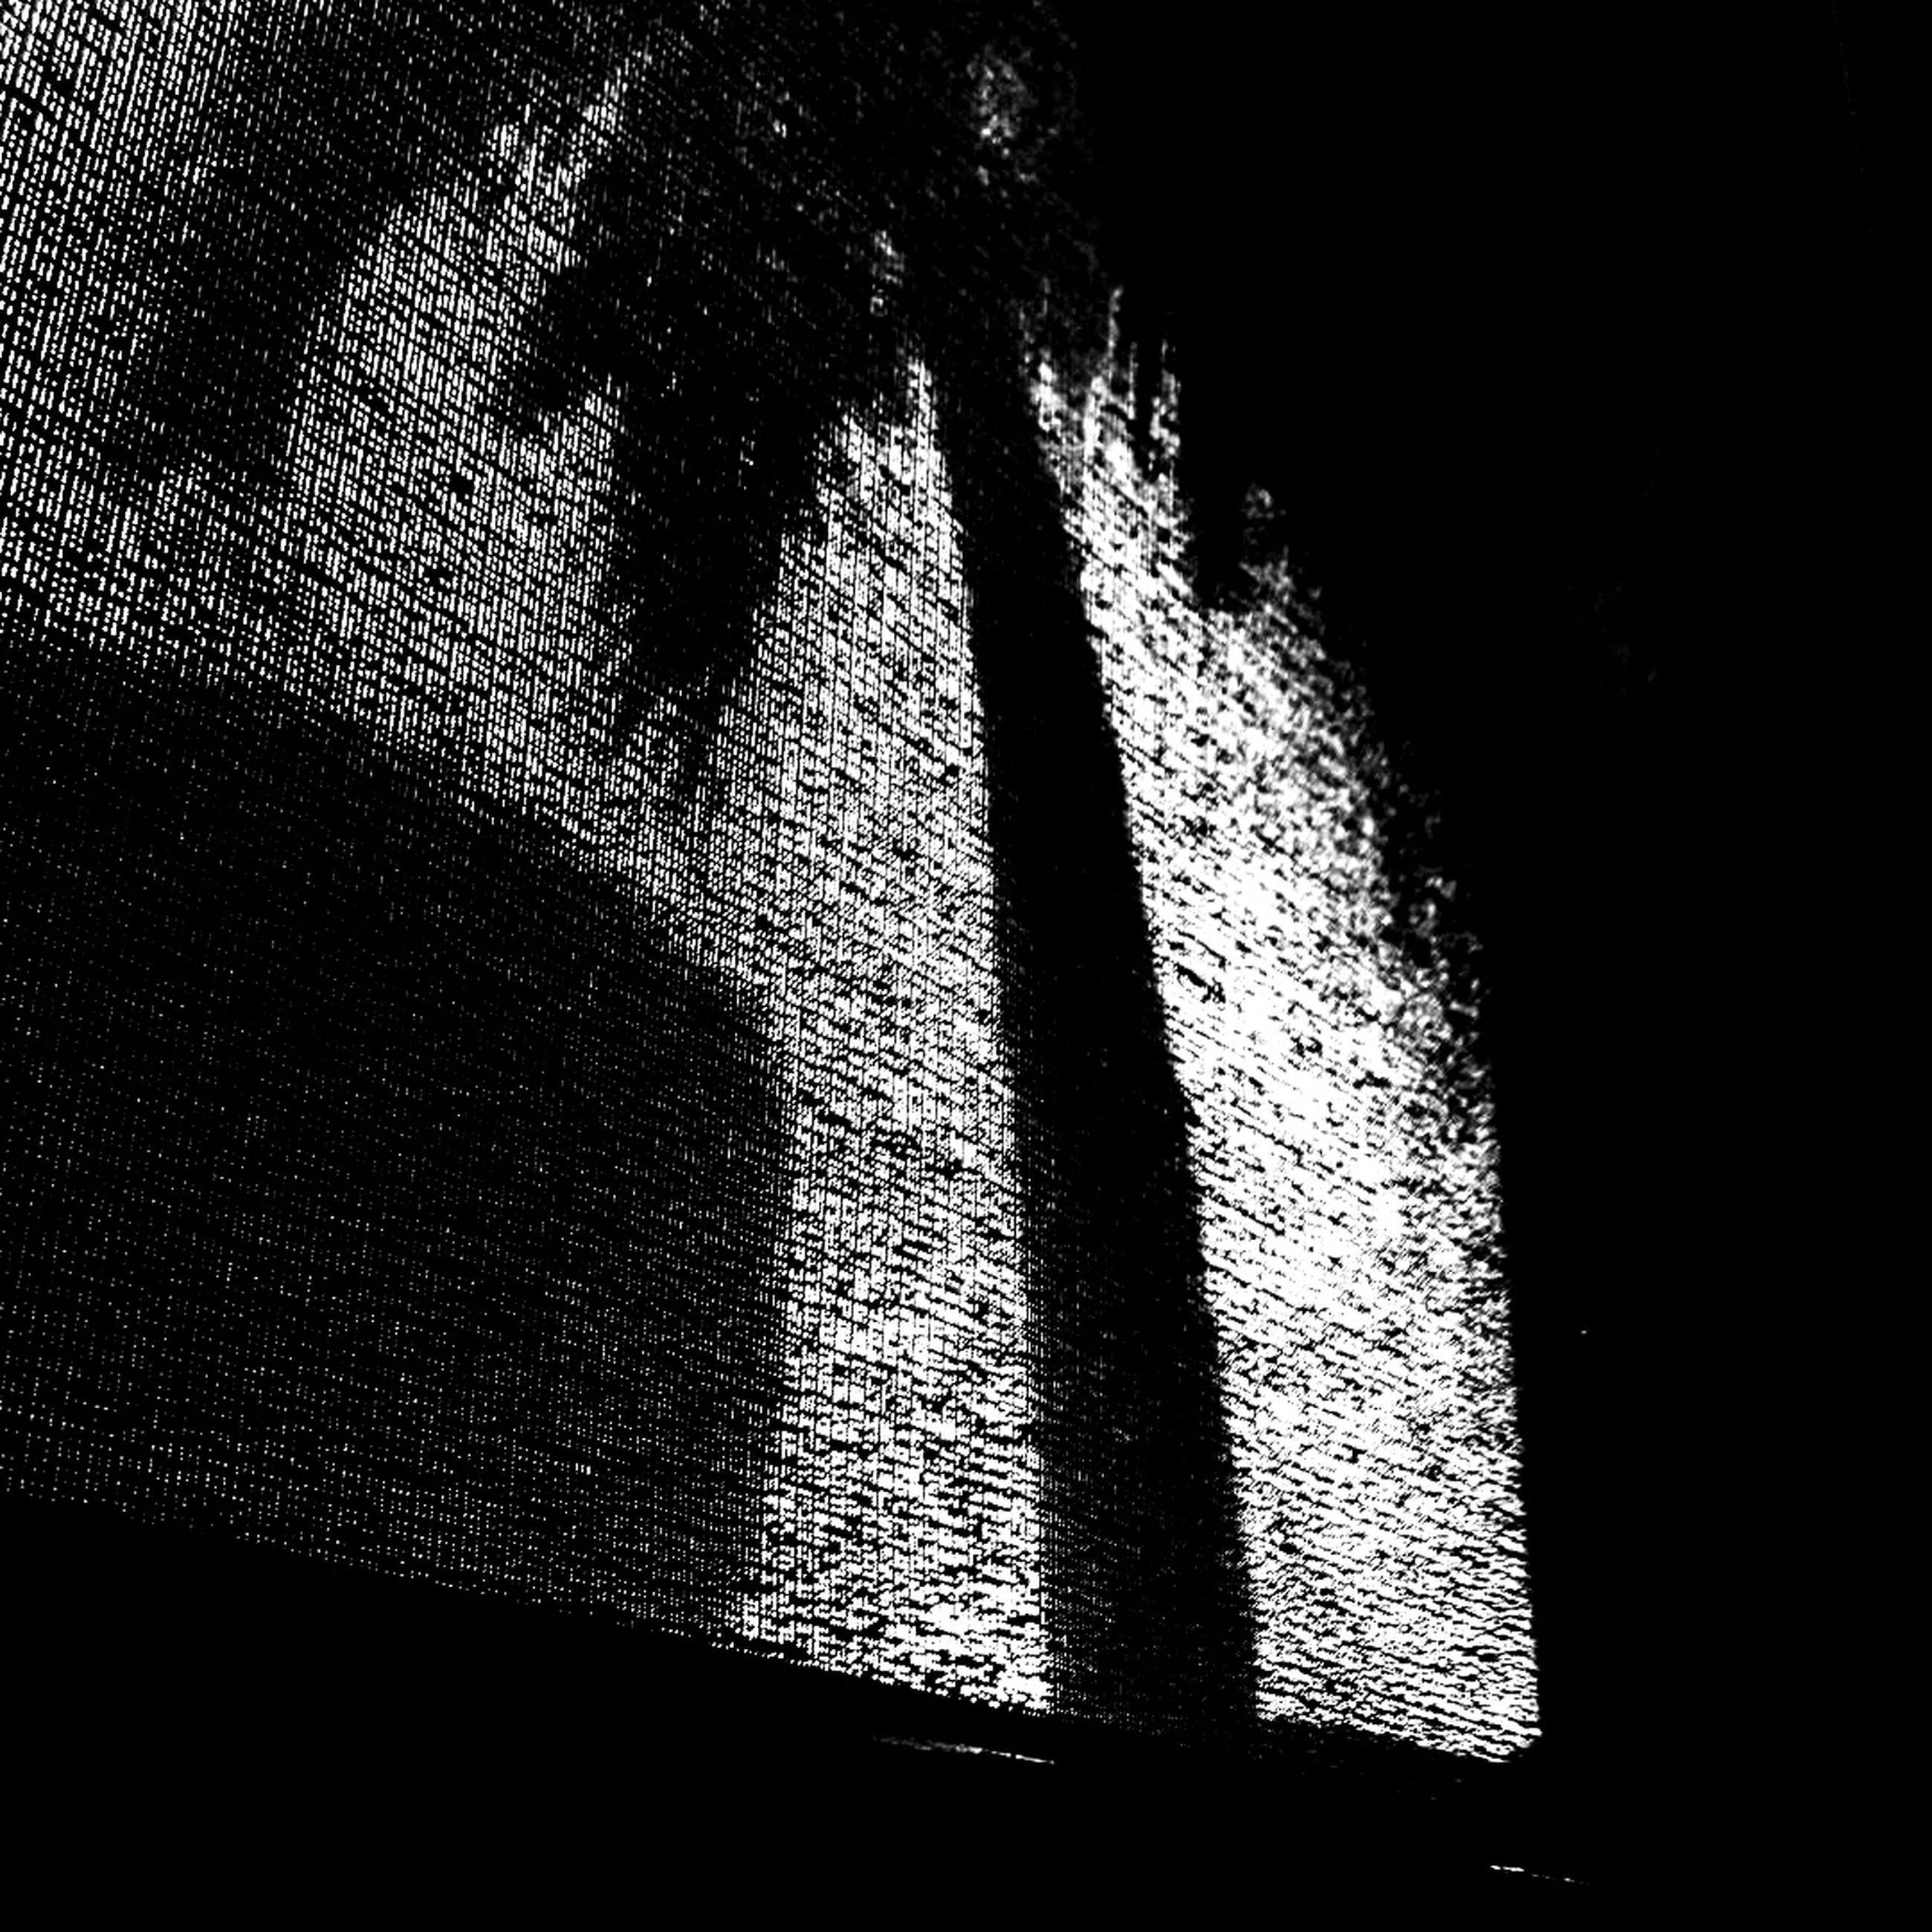 indoors, no people, backgrounds, illuminated, close-up, night, sky